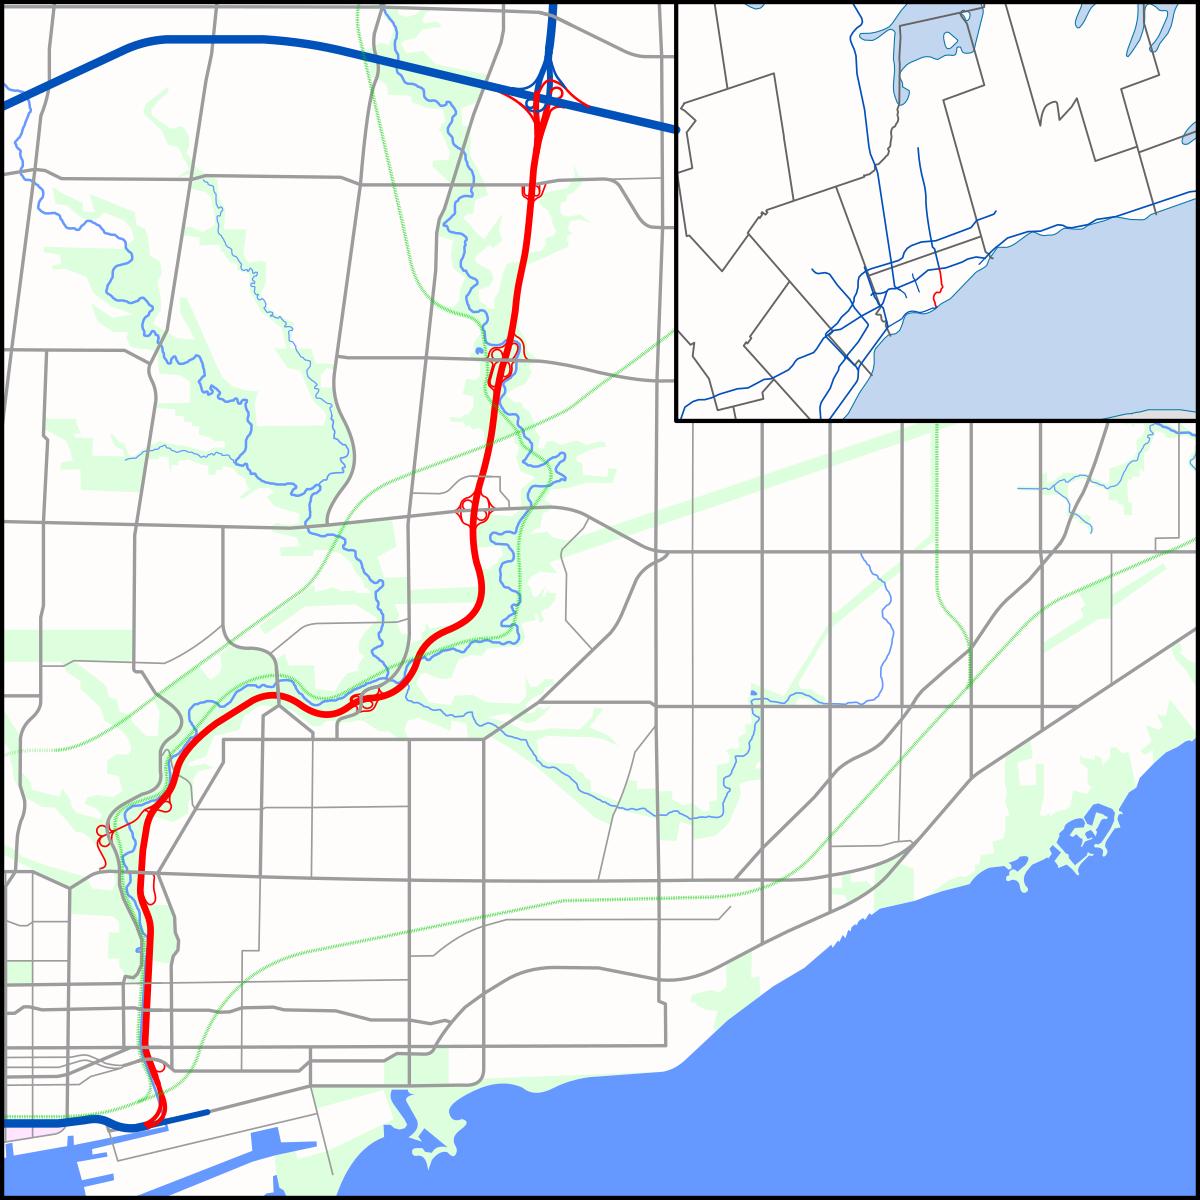 Bend Hwy Region 400 Finch Toronto Black York Escort Steeles